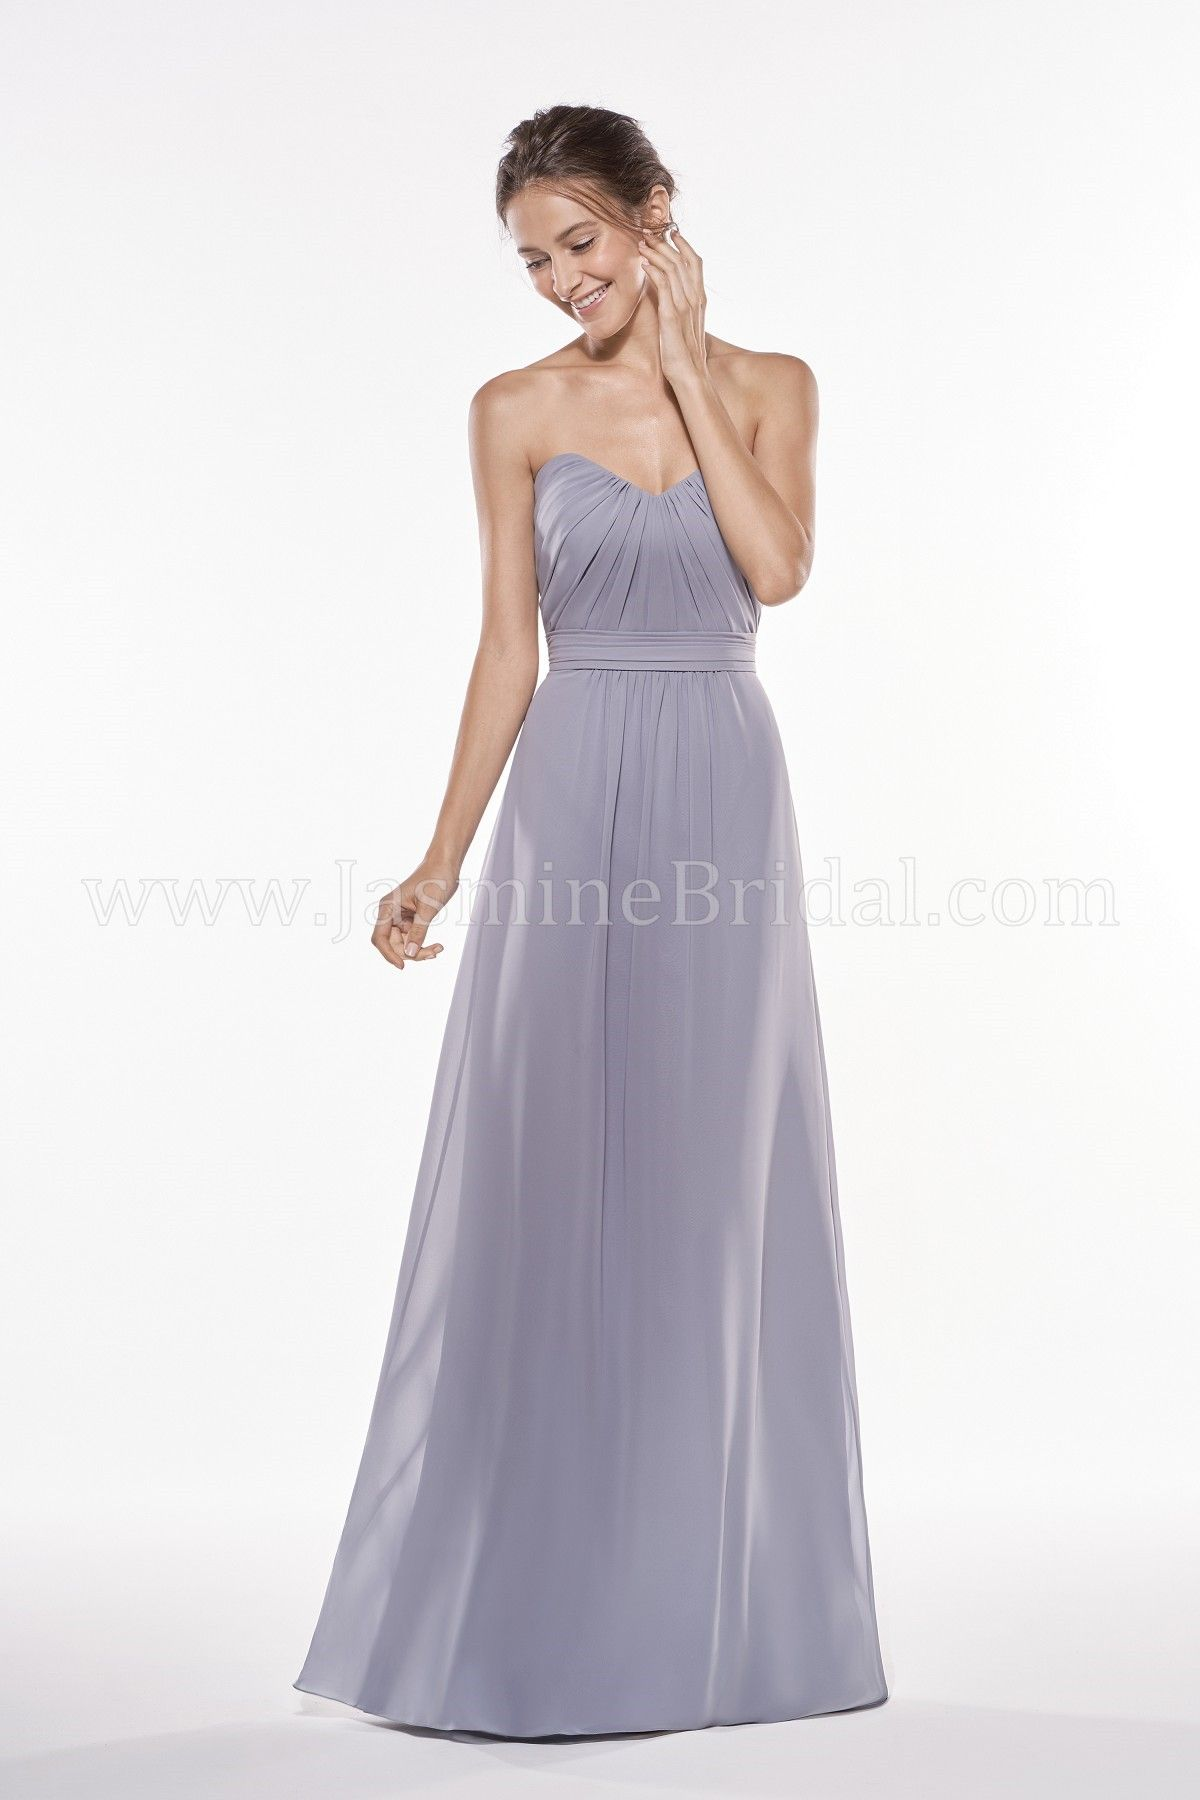 Jasmine Bridal - Jasmine Bridesmaids Style P196005 in Georgette ...